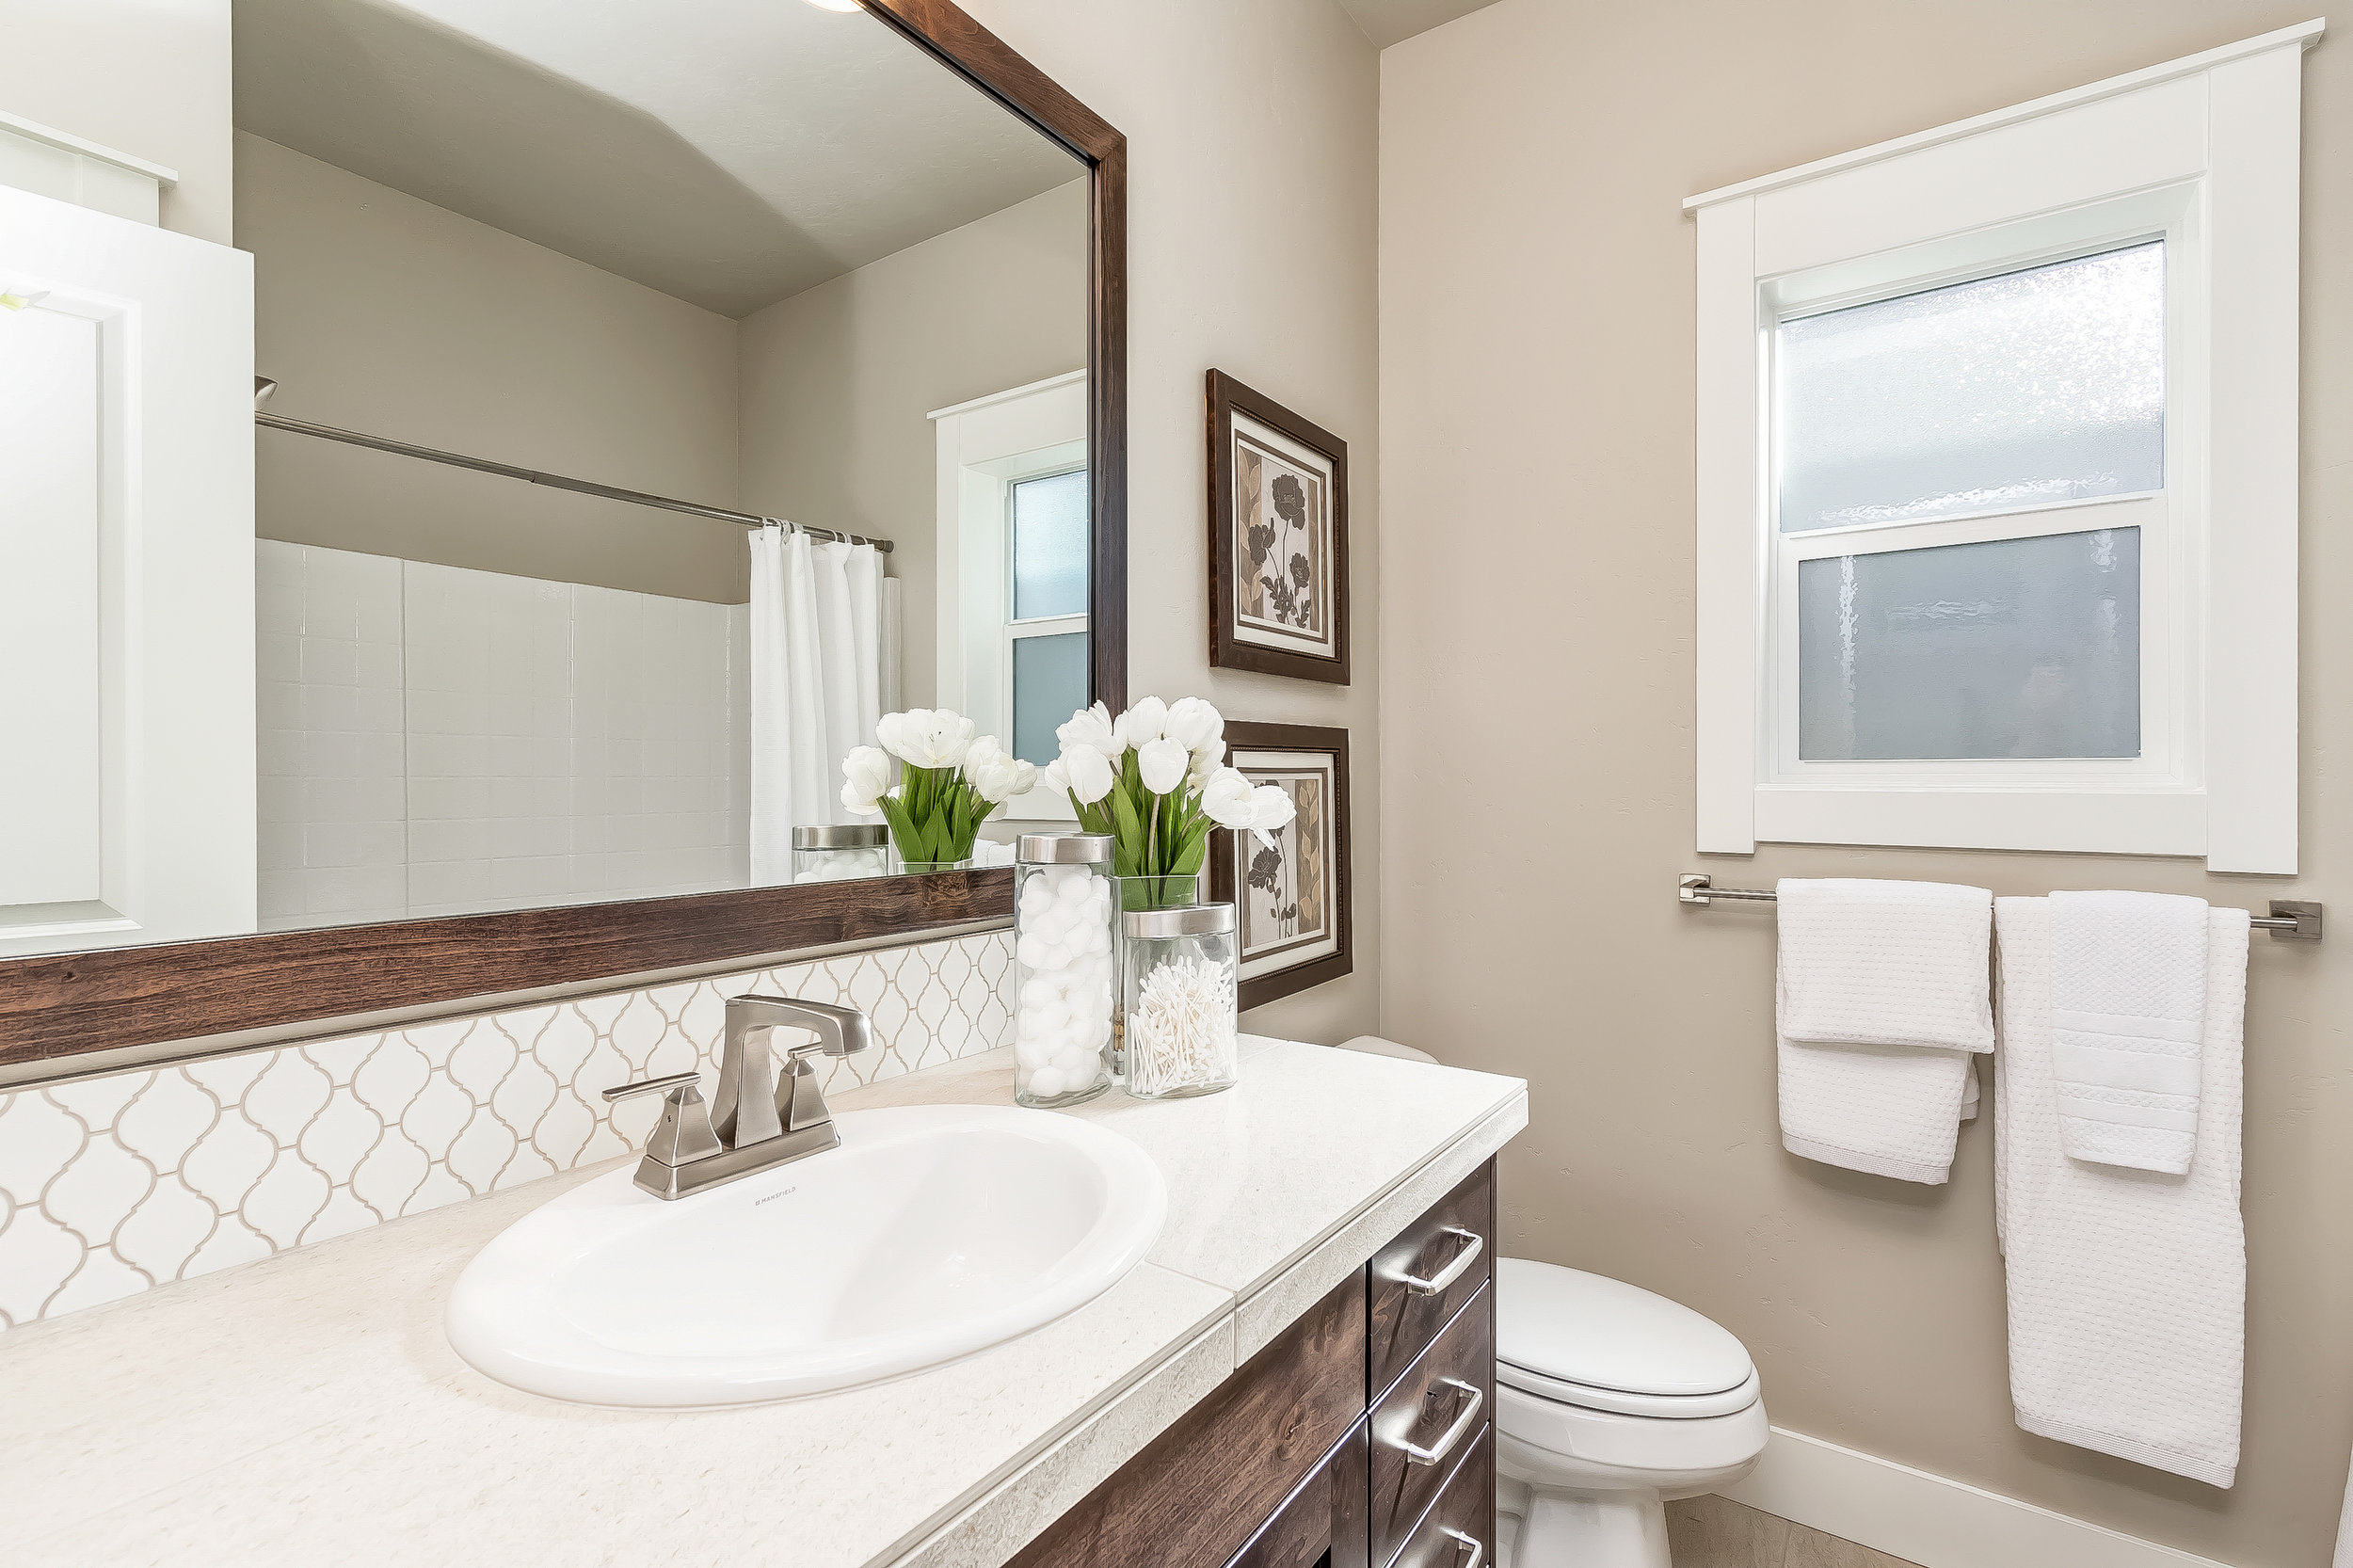 008_Bathroom .jpg